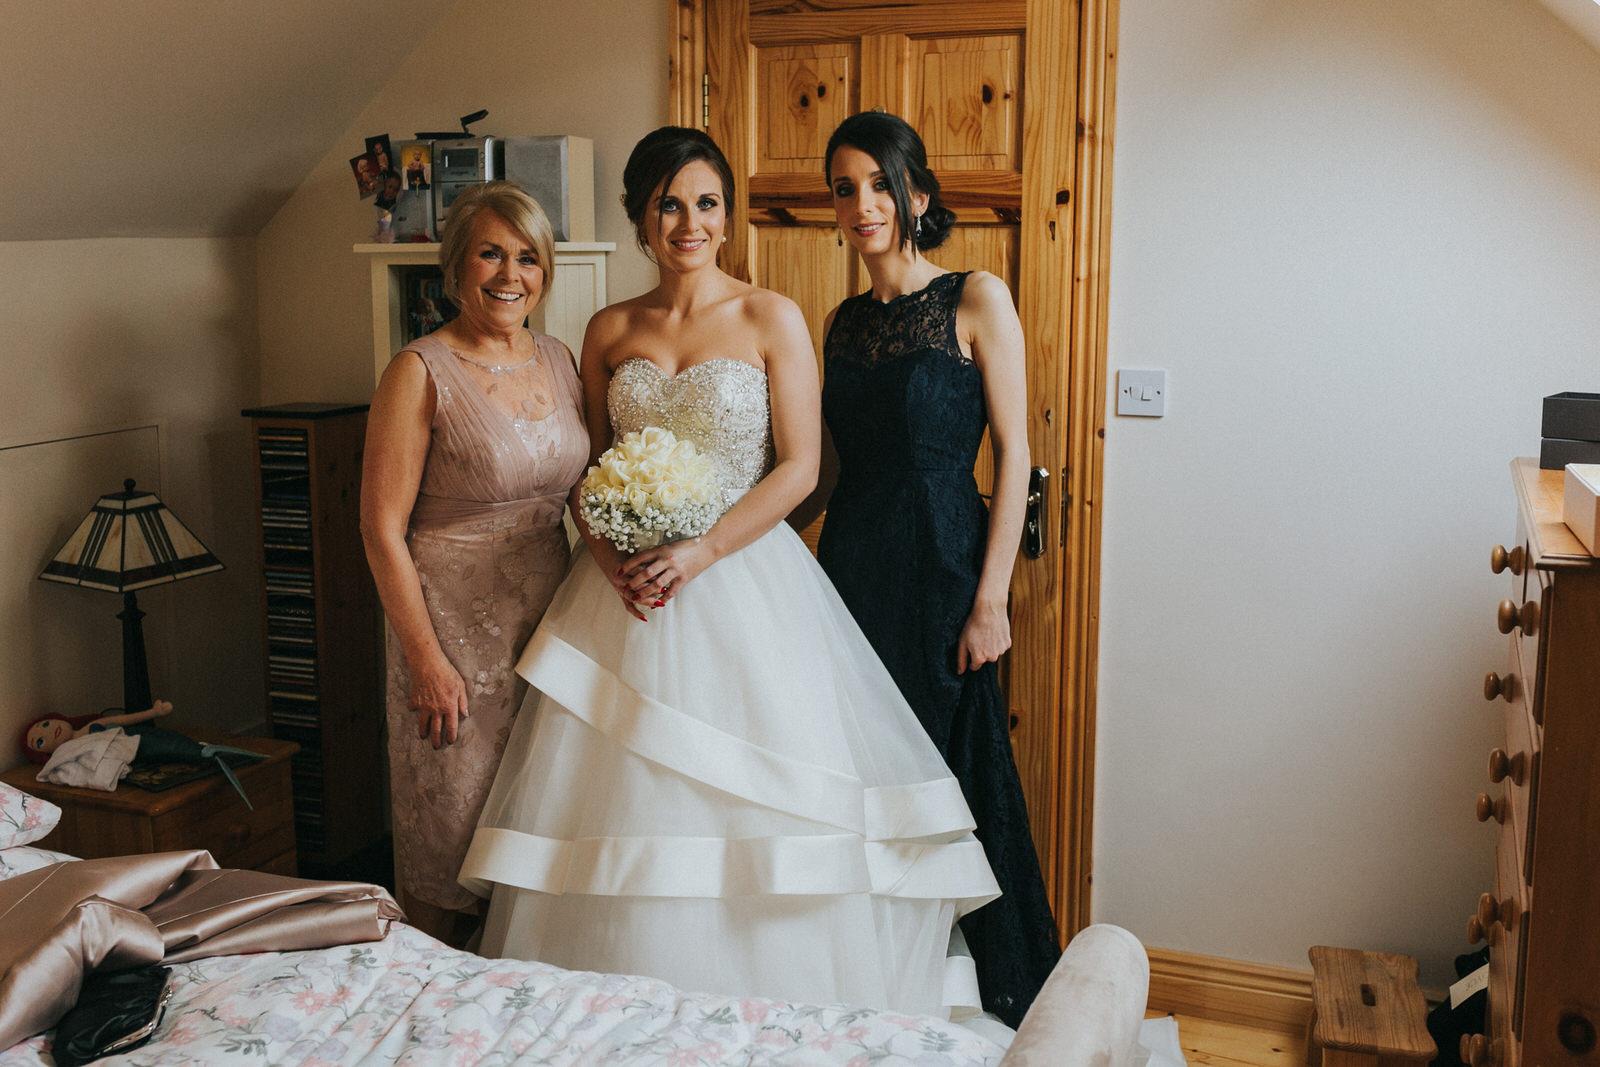 Clonabreany_wedding-photographer_roger_kenny_ireland_018.jpg